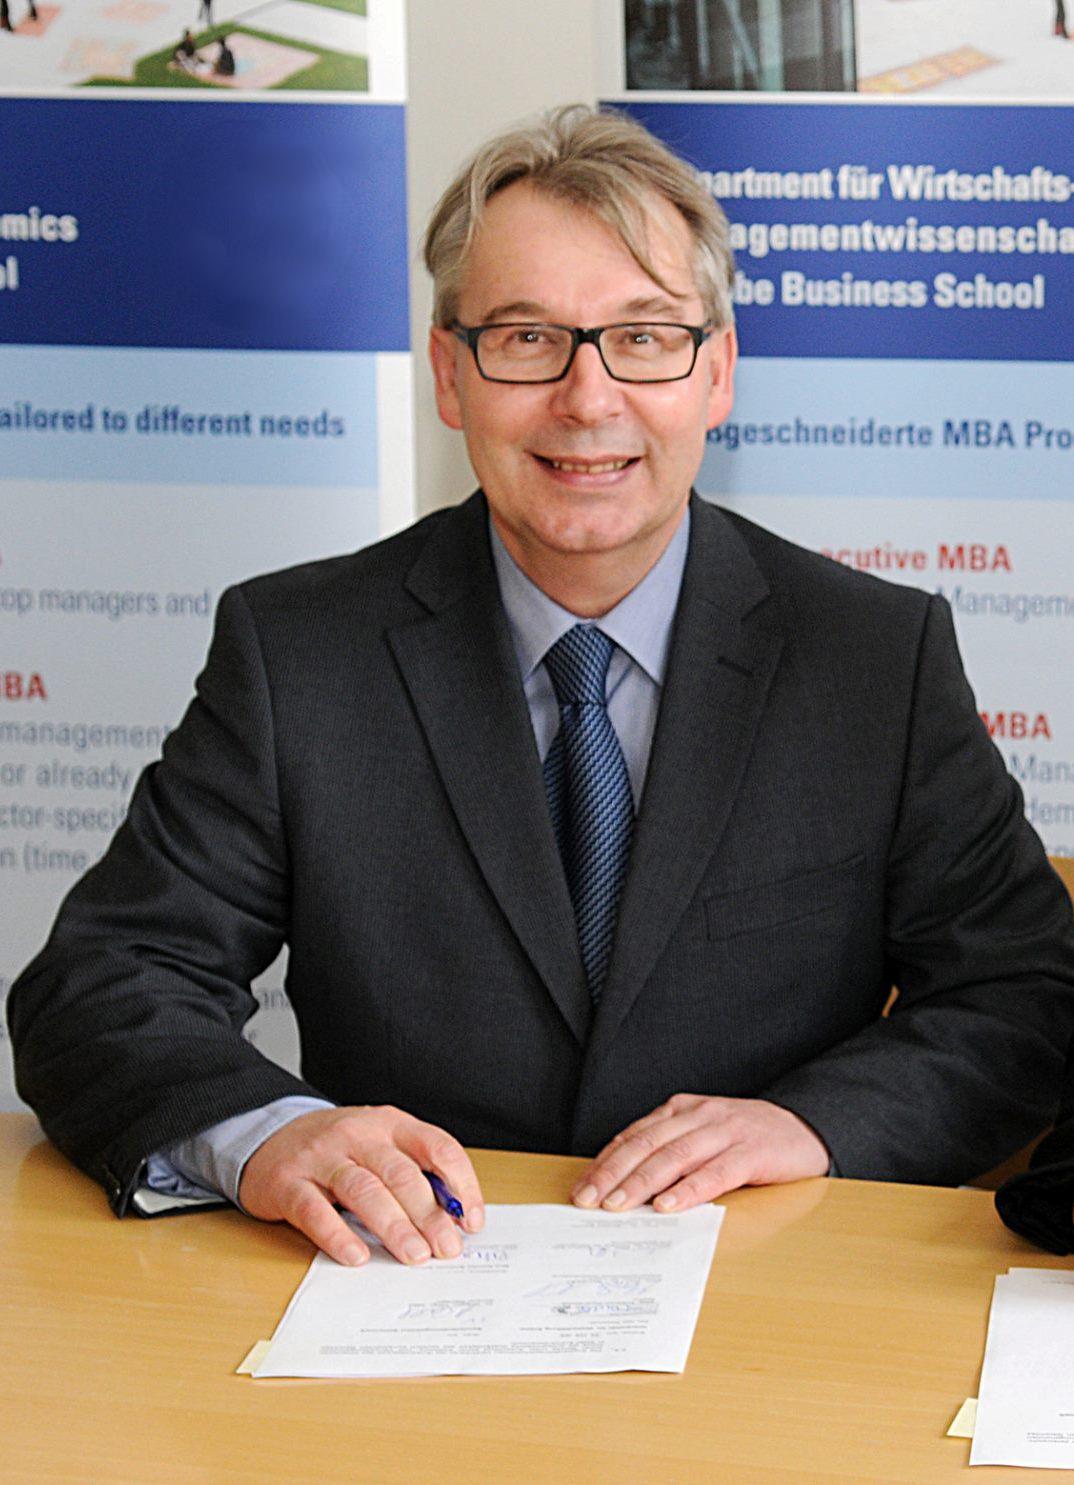 Herbert Schlair